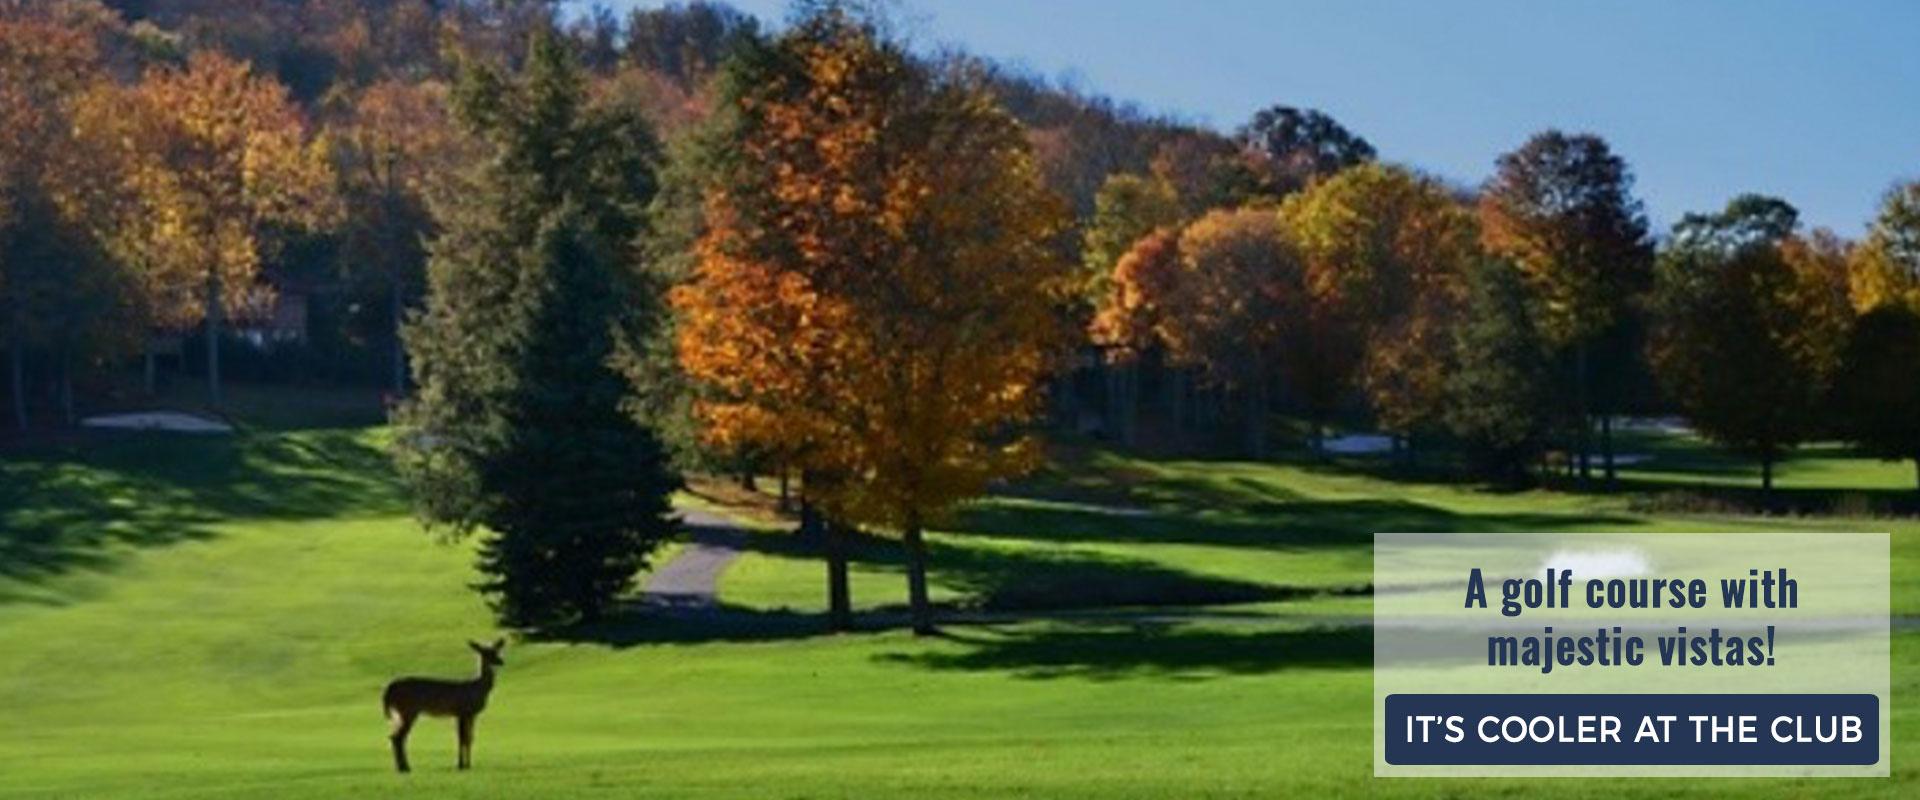 Golf at Beech Mountain Club